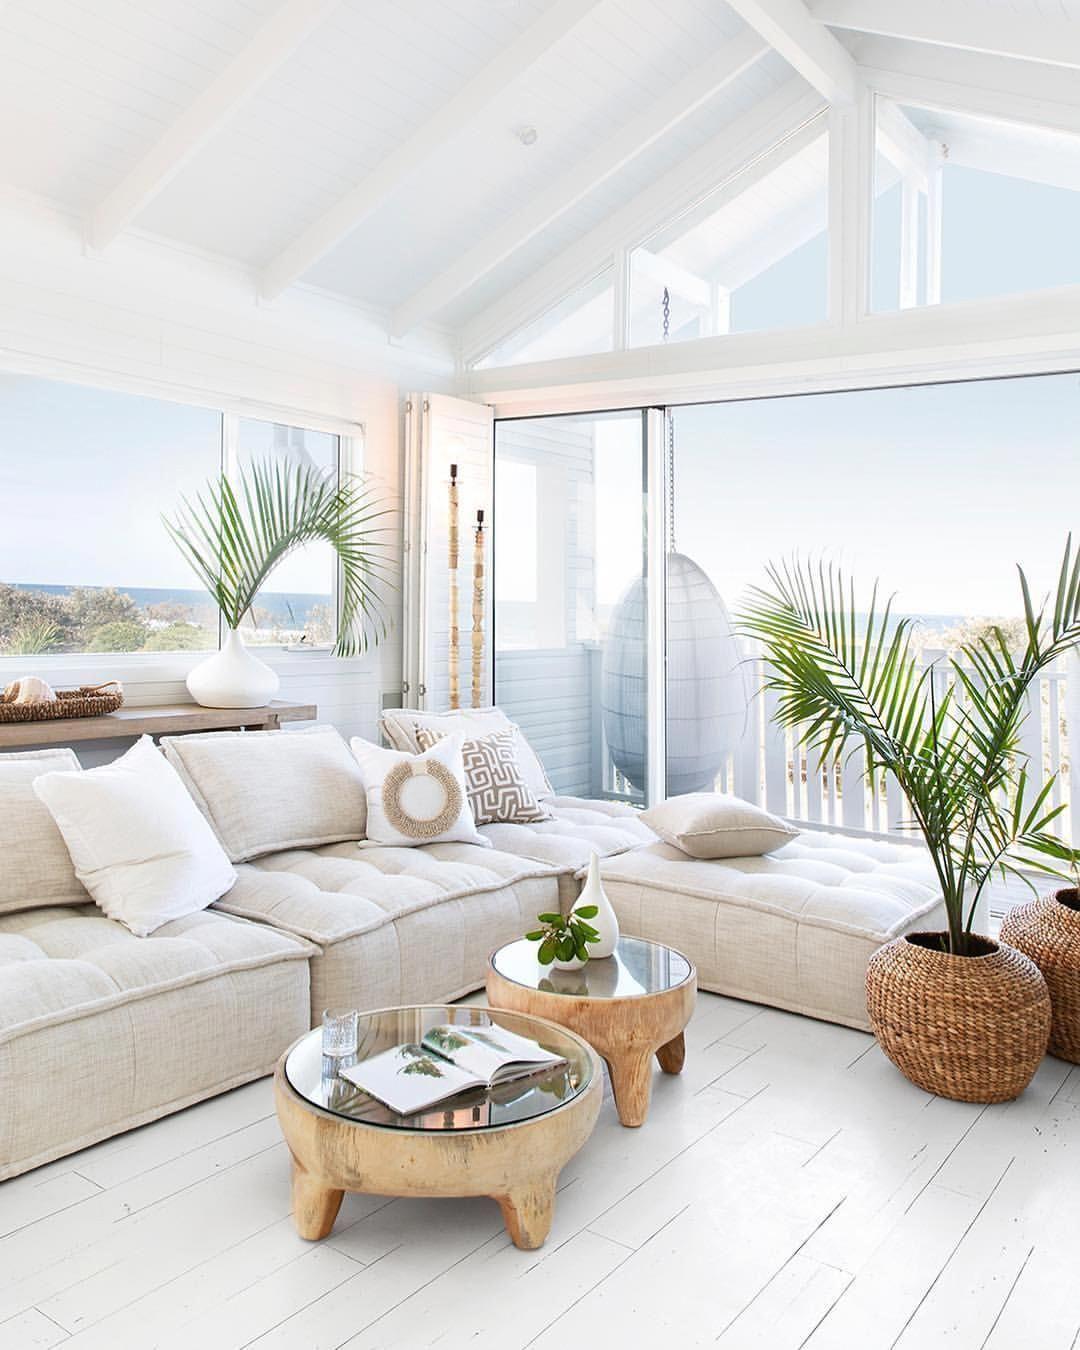 Tropical Beach House Interior: Pin On BEACH HOUSE INTERIORS